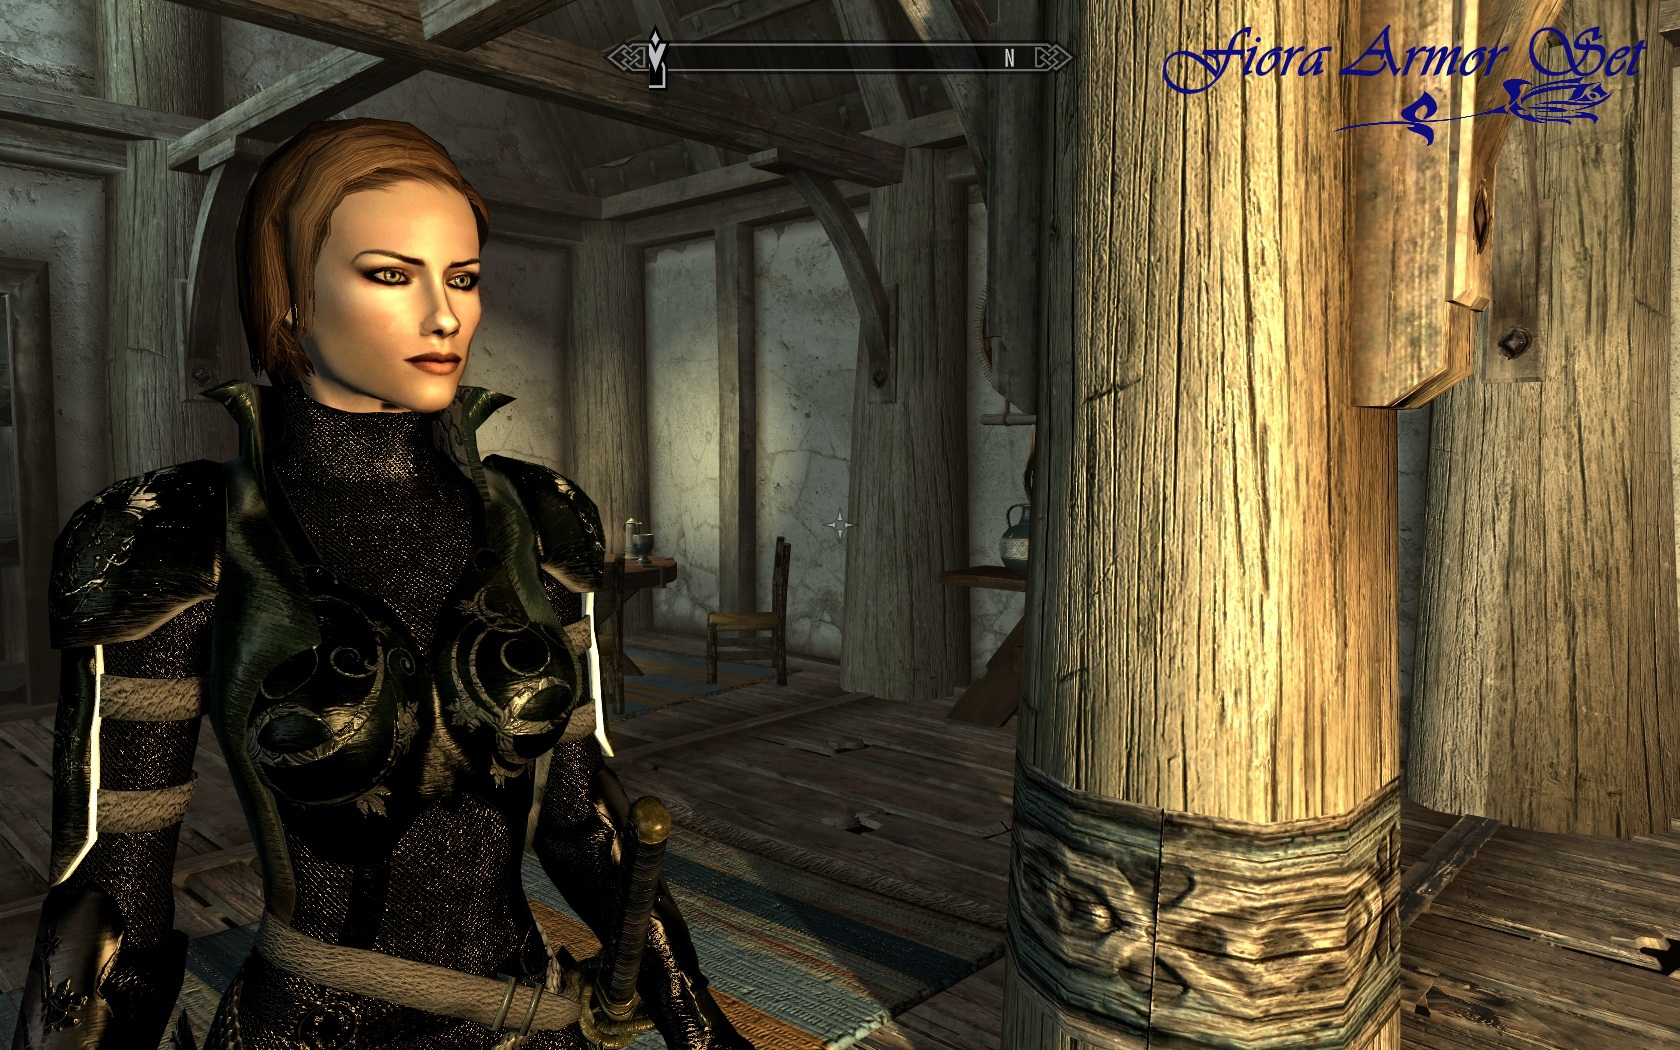 Fiora_Armor_Set.jpg